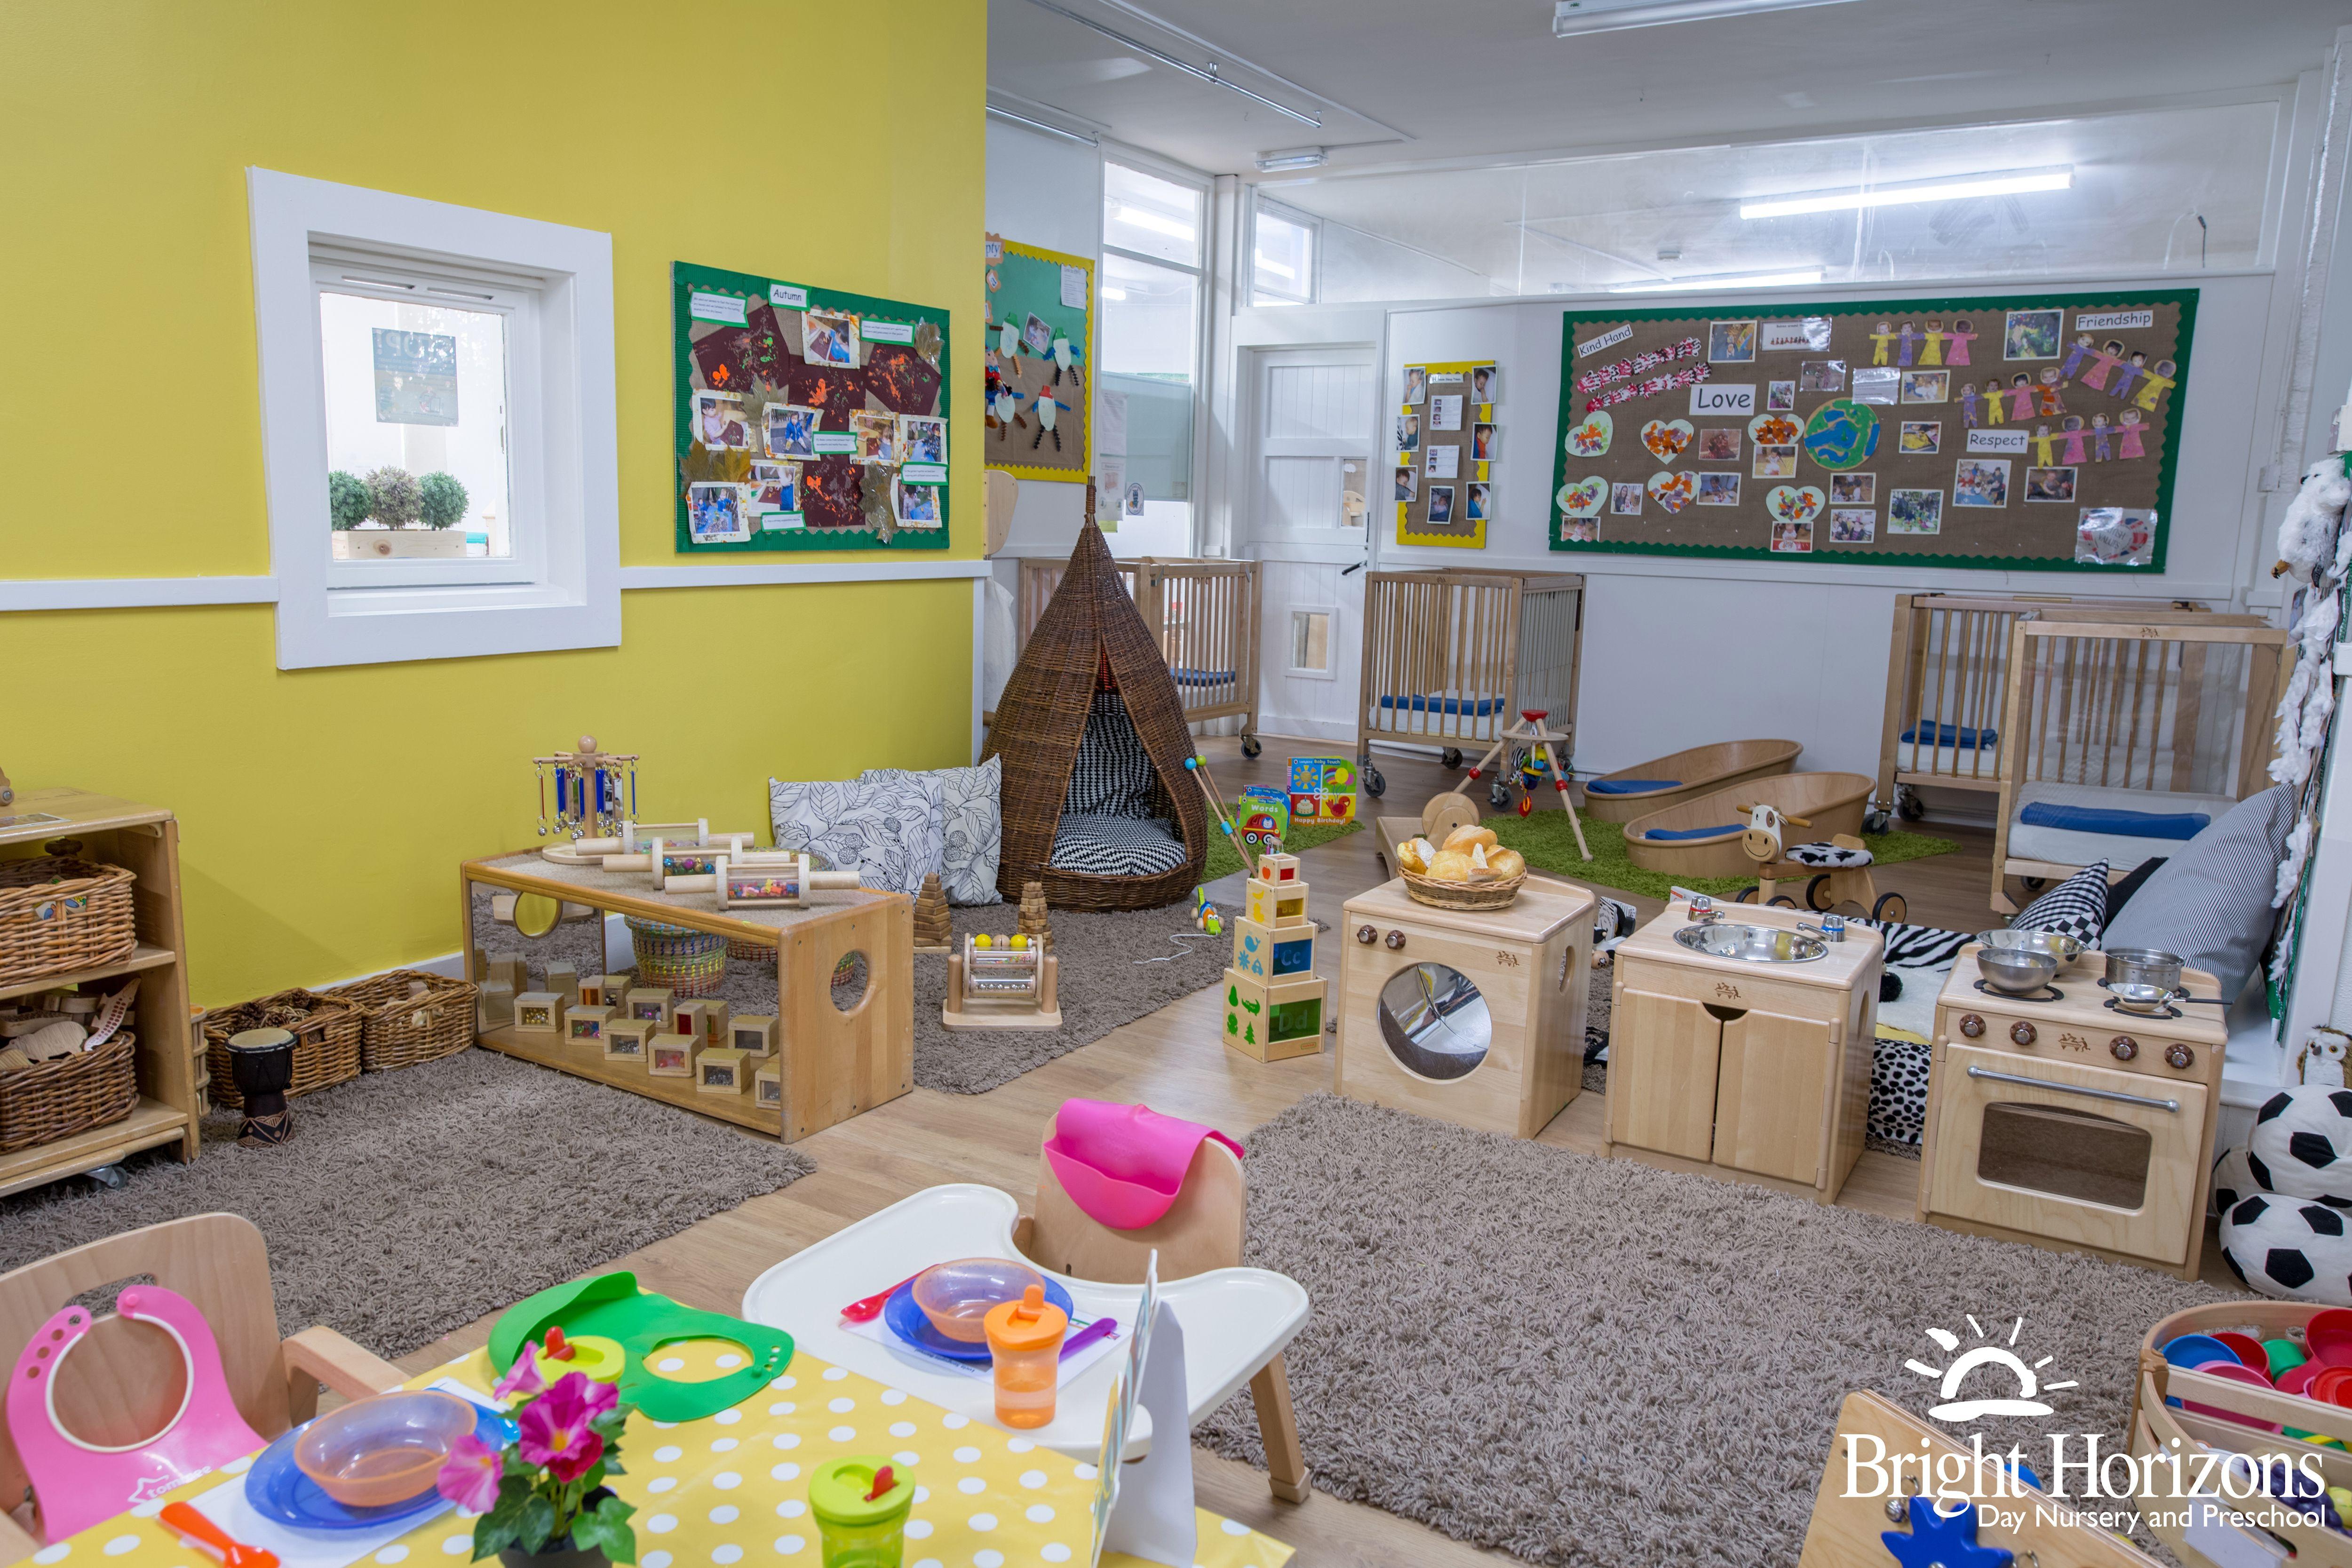 Fl Place Nursery And Preschool